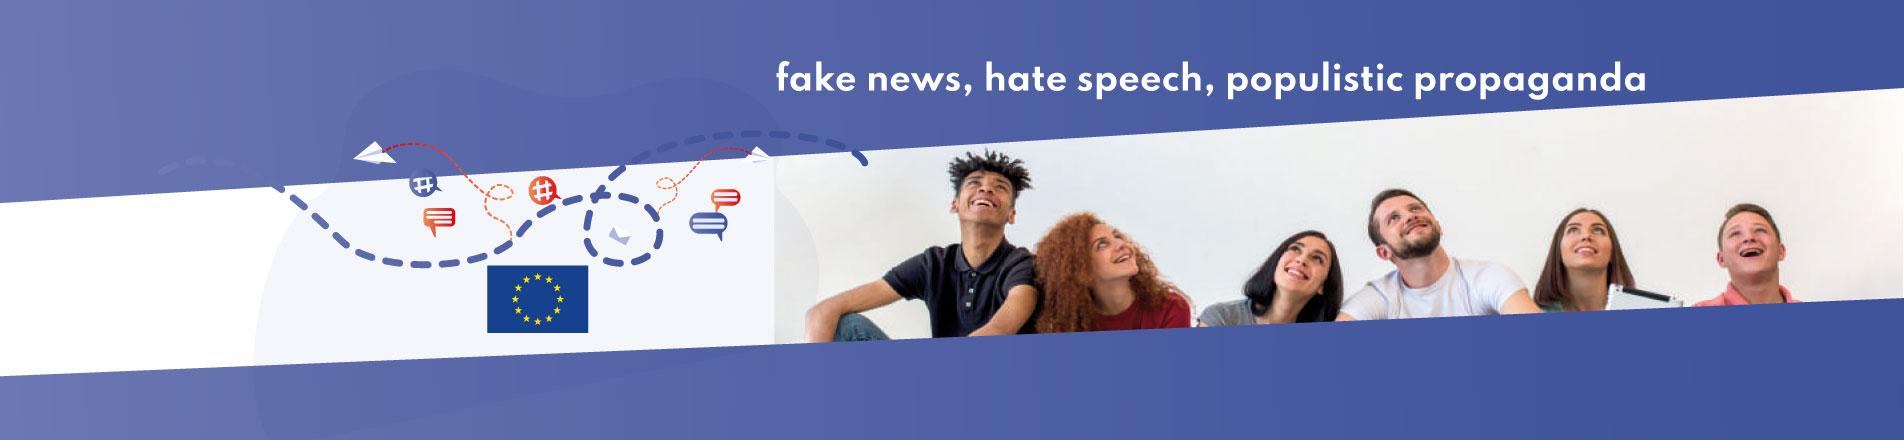 slider-commit-fake-news,-hate-speech,-populistic-propaganda